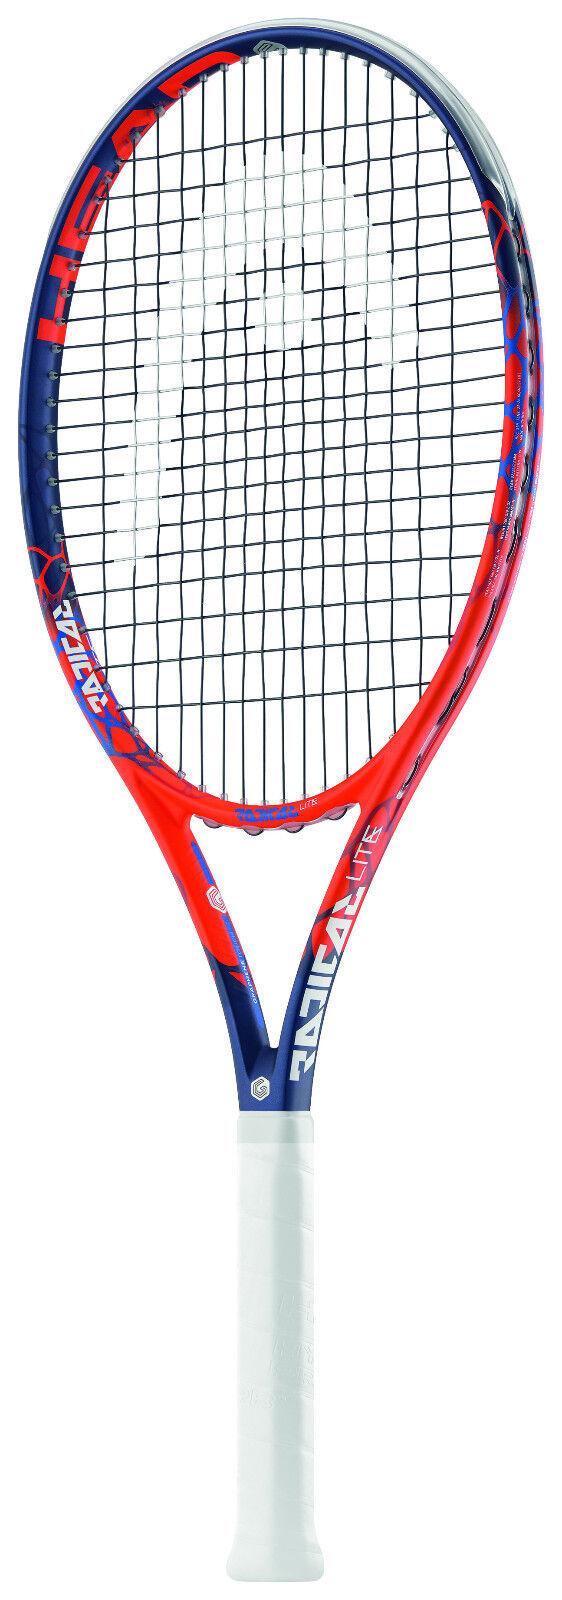 Head  graphene Touch radical Lite raqueta de tenis  descuento de ventas en línea